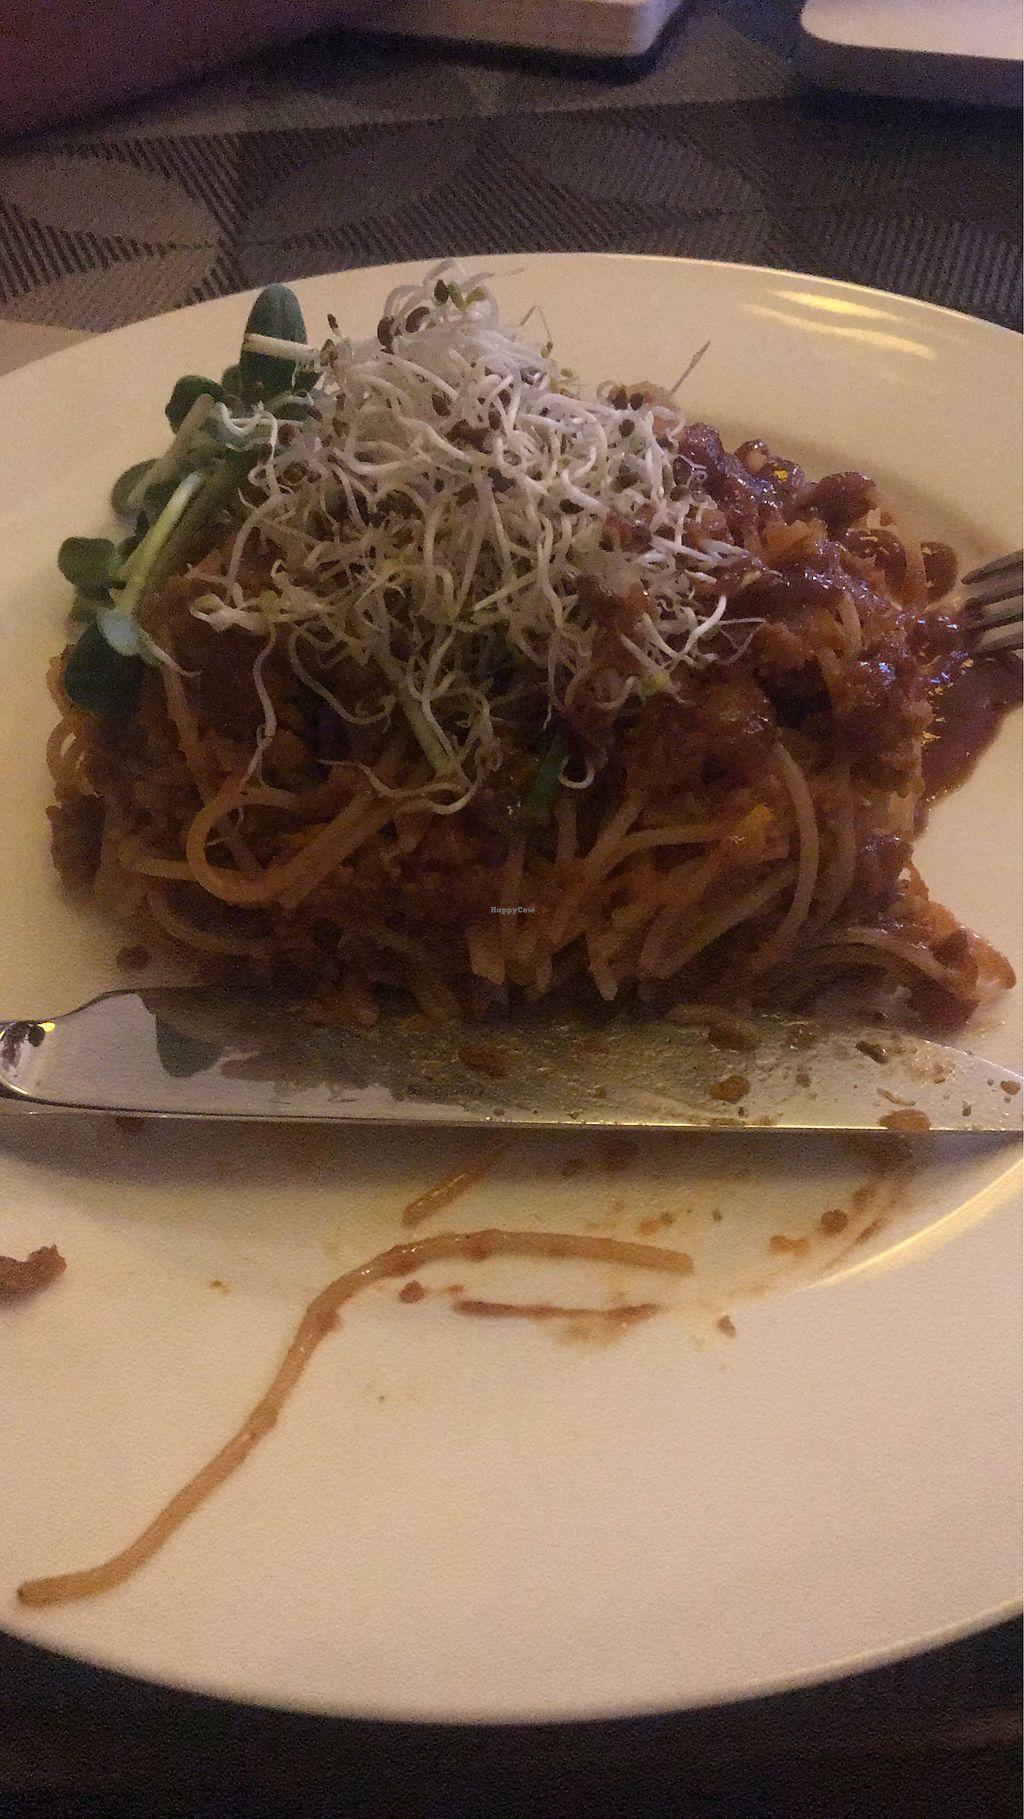 "Photo of Kolo  by <a href=""/members/profile/Duki"">Duki</a> <br/>Spaghetti  <br/> March 9, 2018  - <a href='/contact/abuse/image/95839/368513'>Report</a>"